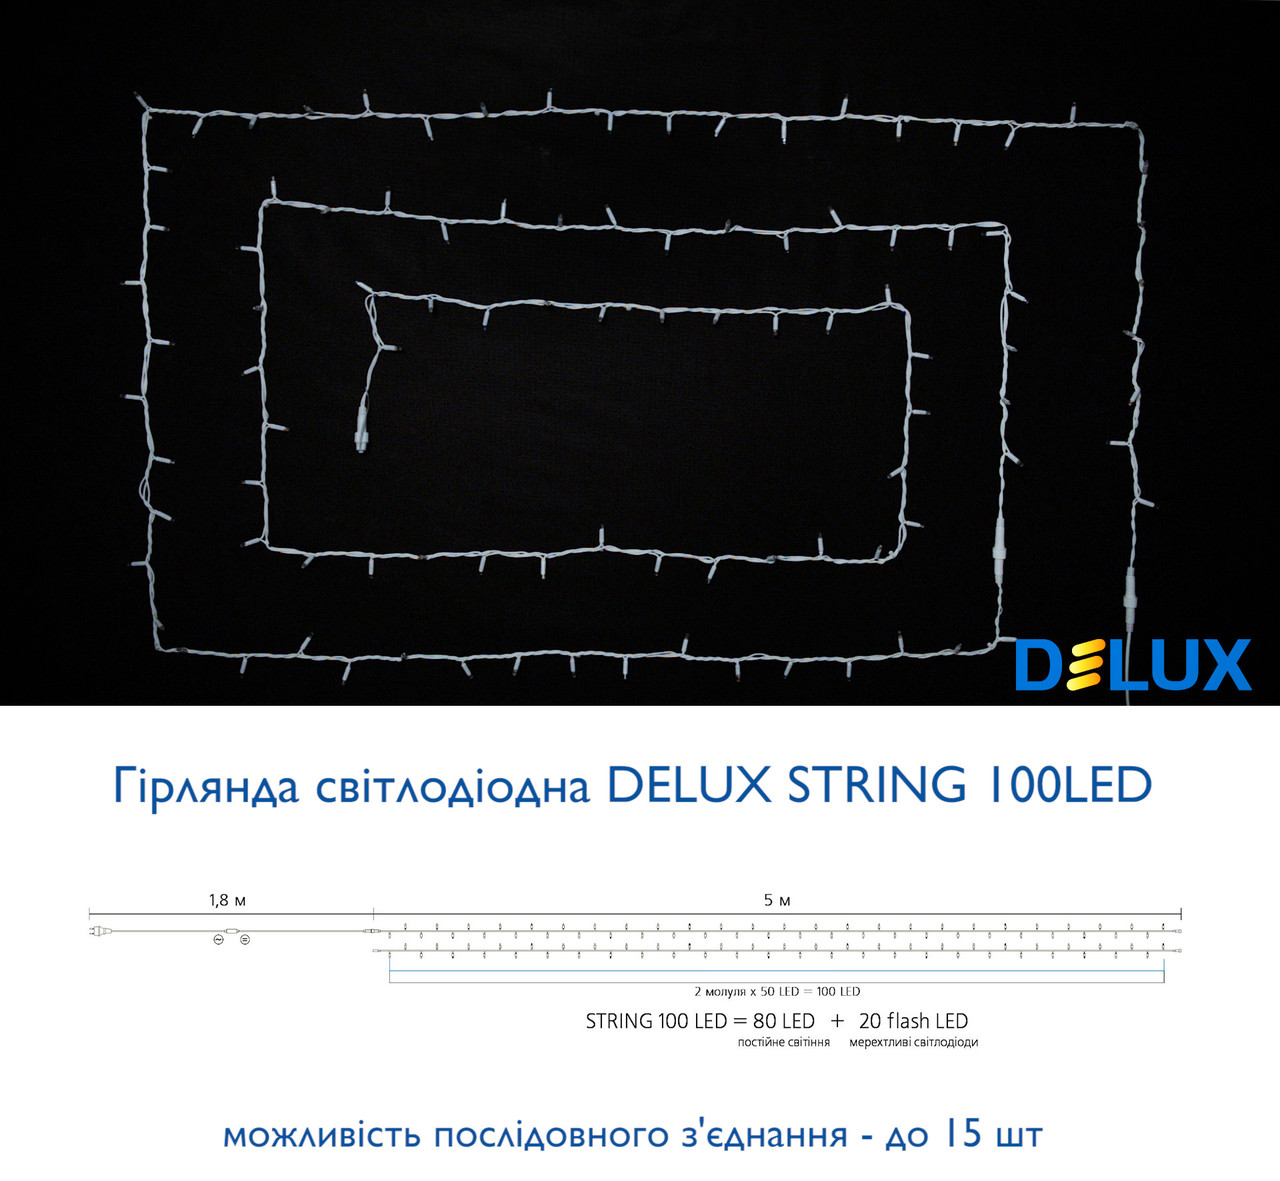 Гирлянда уличная DELUX STRING 100LED 10m (2*5m) 20 flash желт/бел IP44 EN